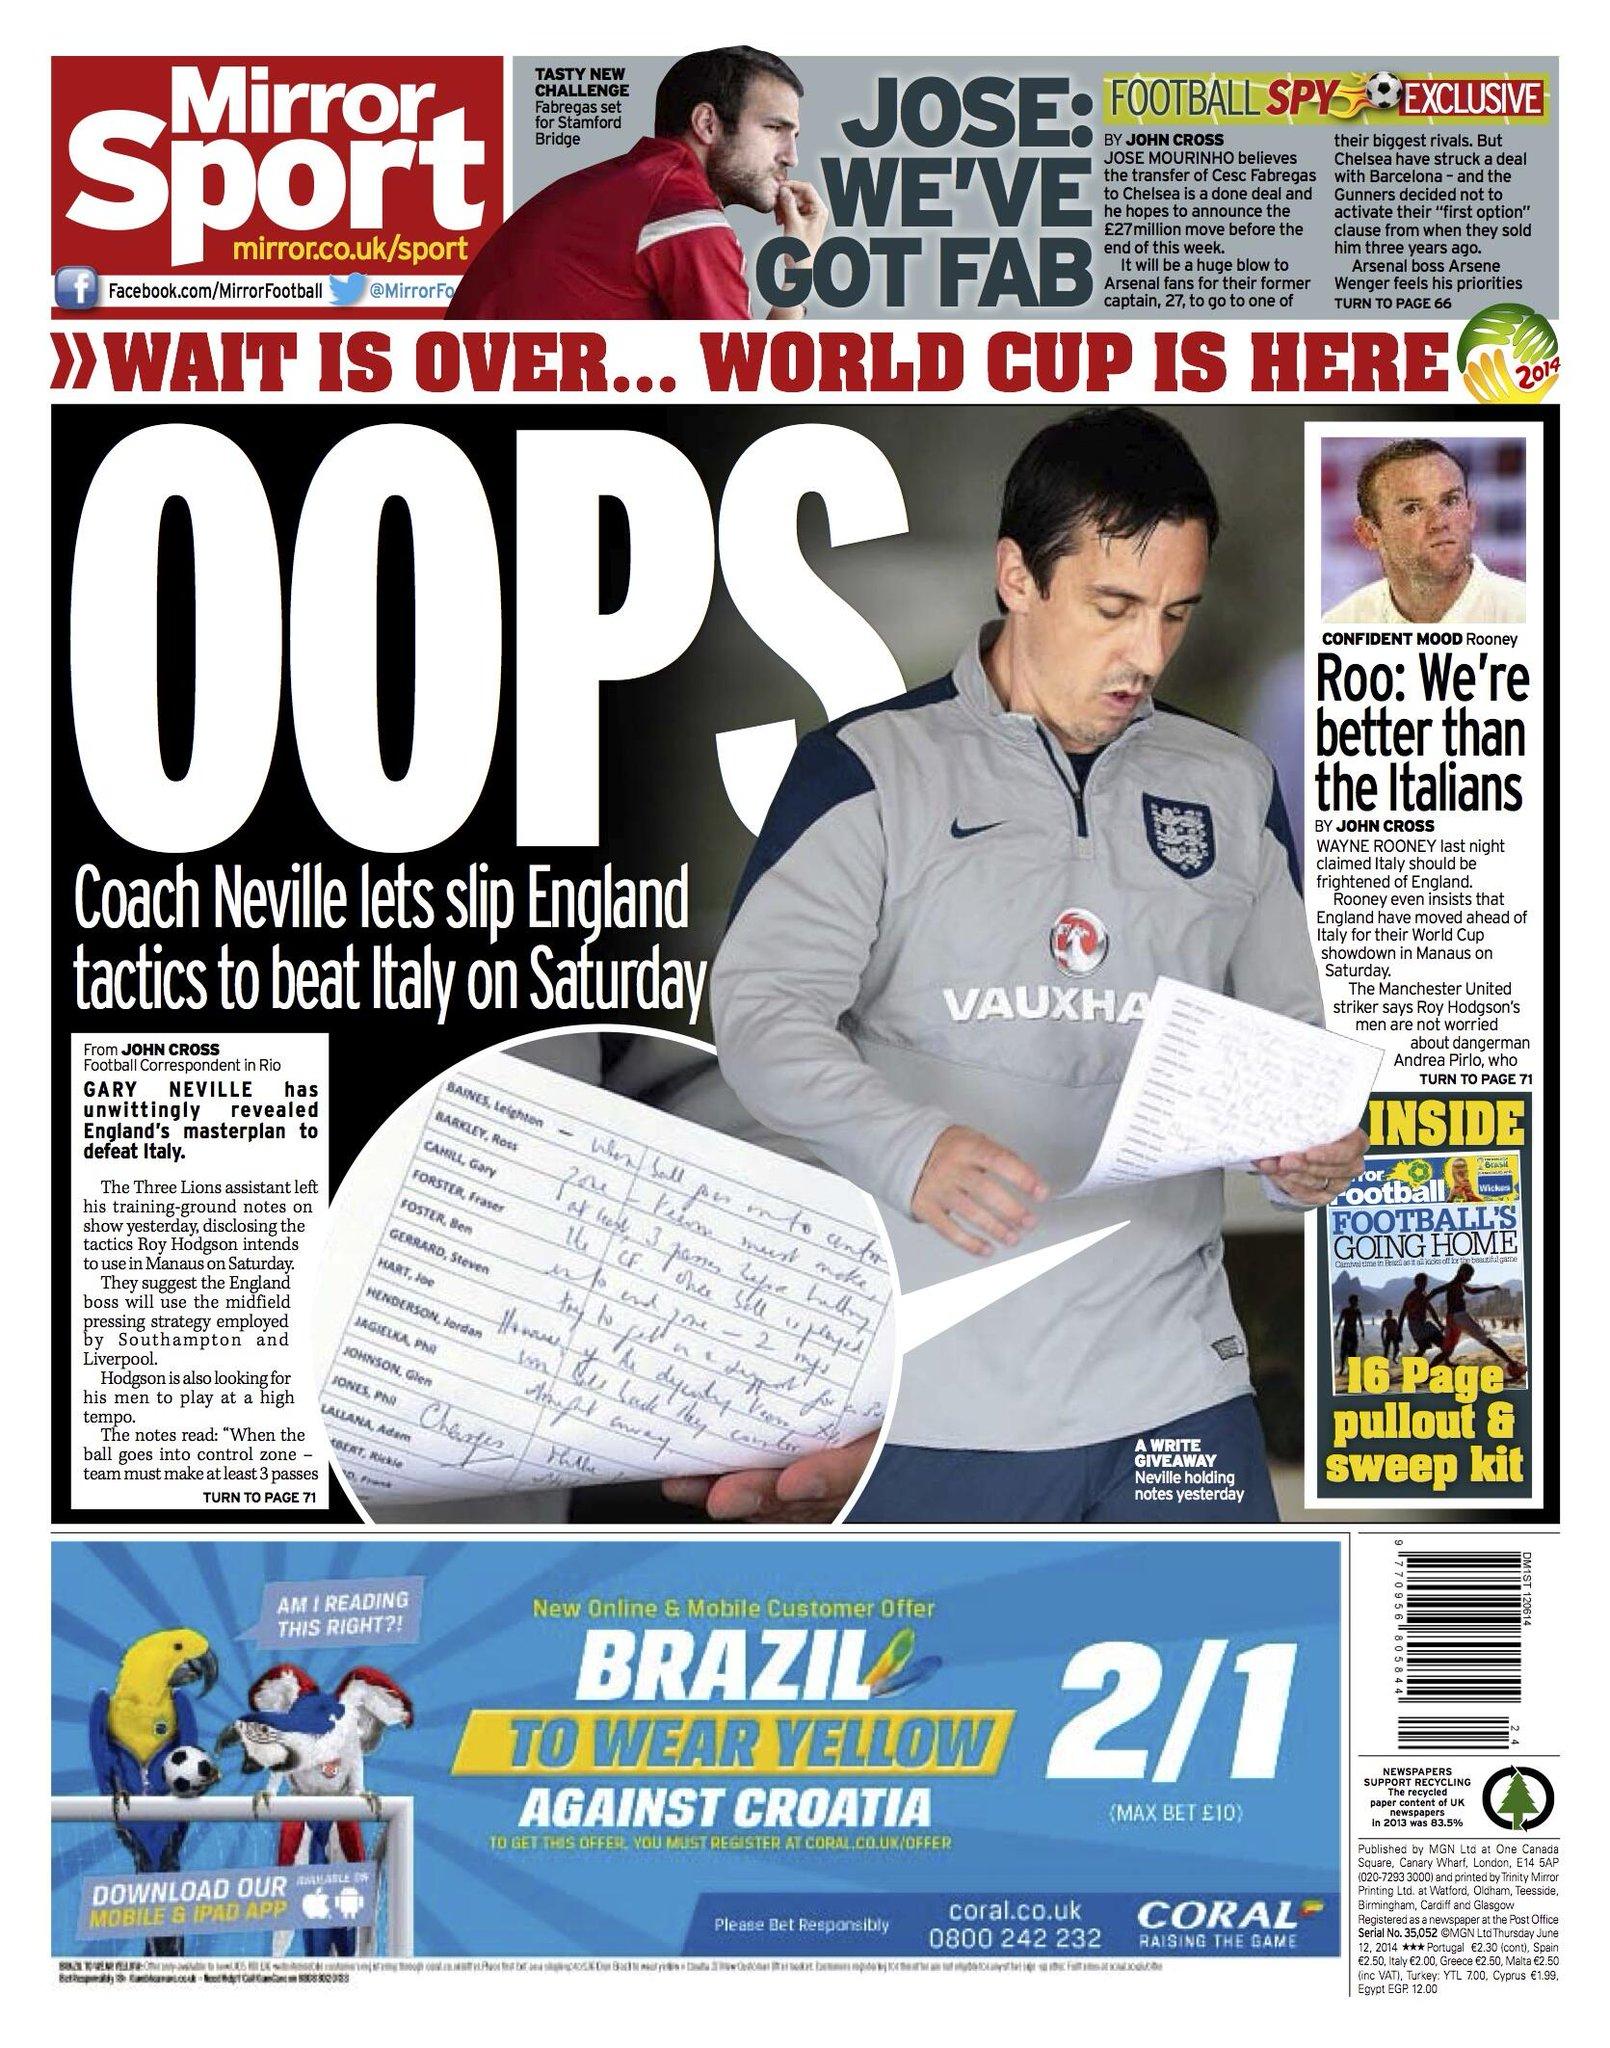 Berita Bola - Gary Neville Tak Sengaja Bongkar Catatan Strategi Timnas Inggris Hadapi Italia! -